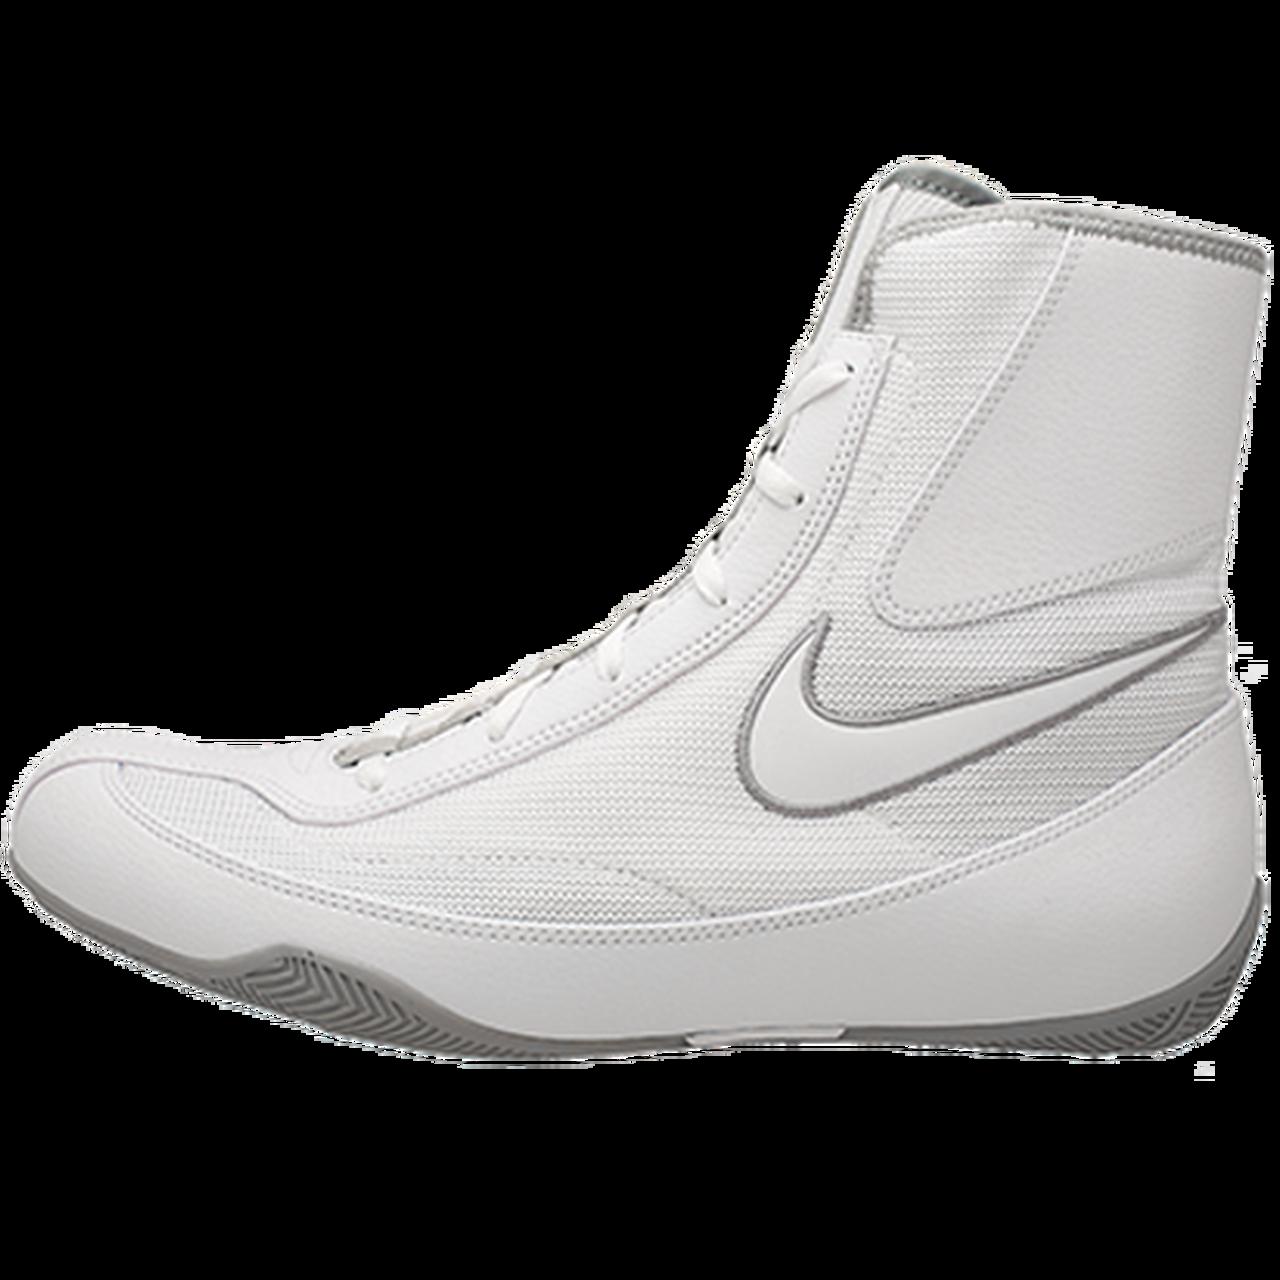 Nike Machomai 2.0 Black Boxing Shoes